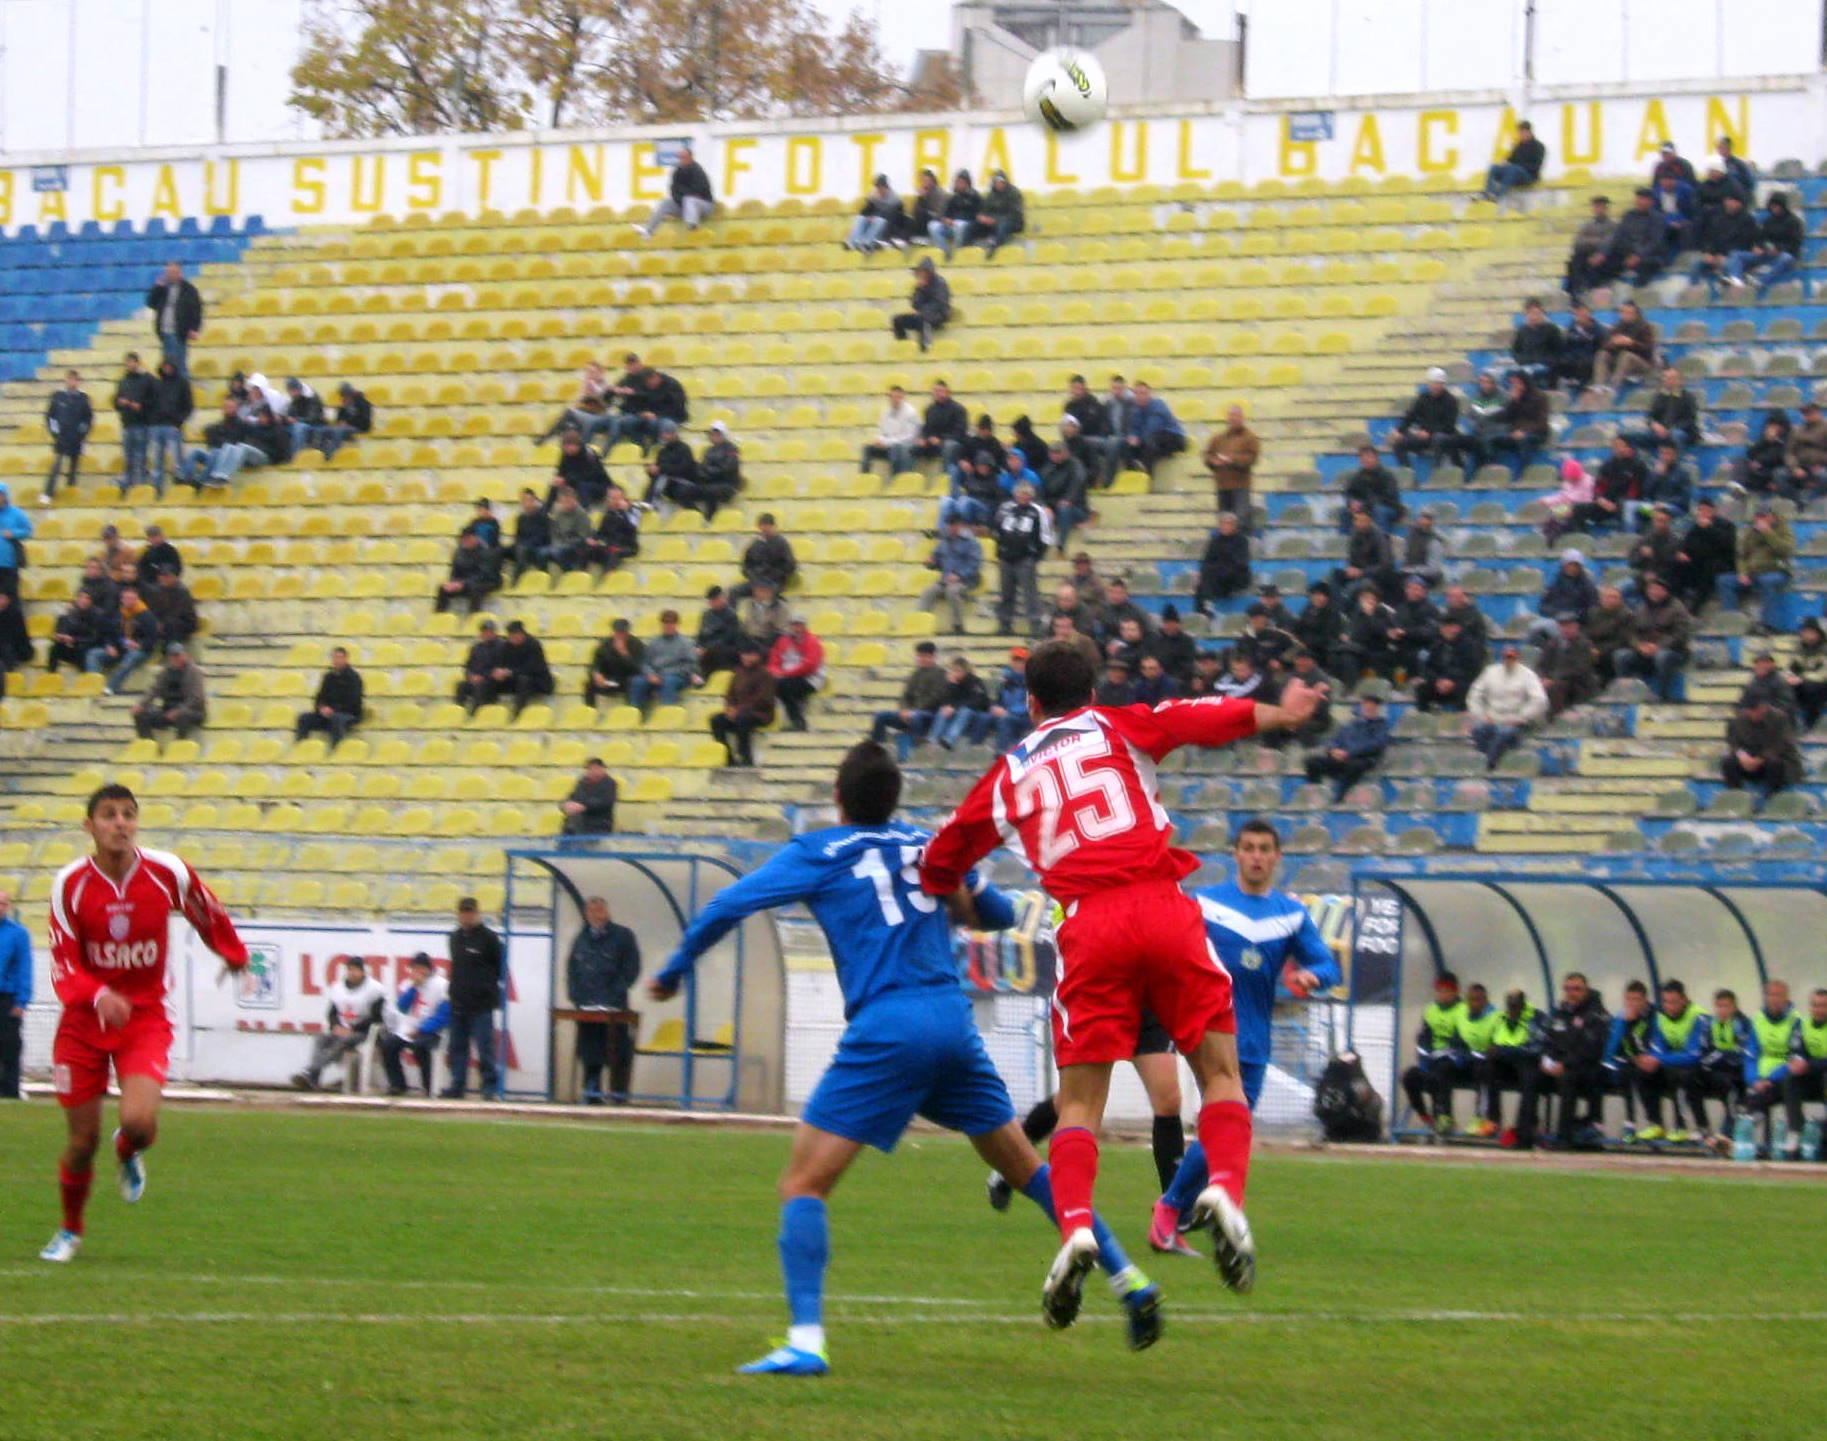 Nou-promovatele FC Botosani si Sageata Navodari au remizat, scor 1-1 in etapa a III-a a Ligii I! VIDEO